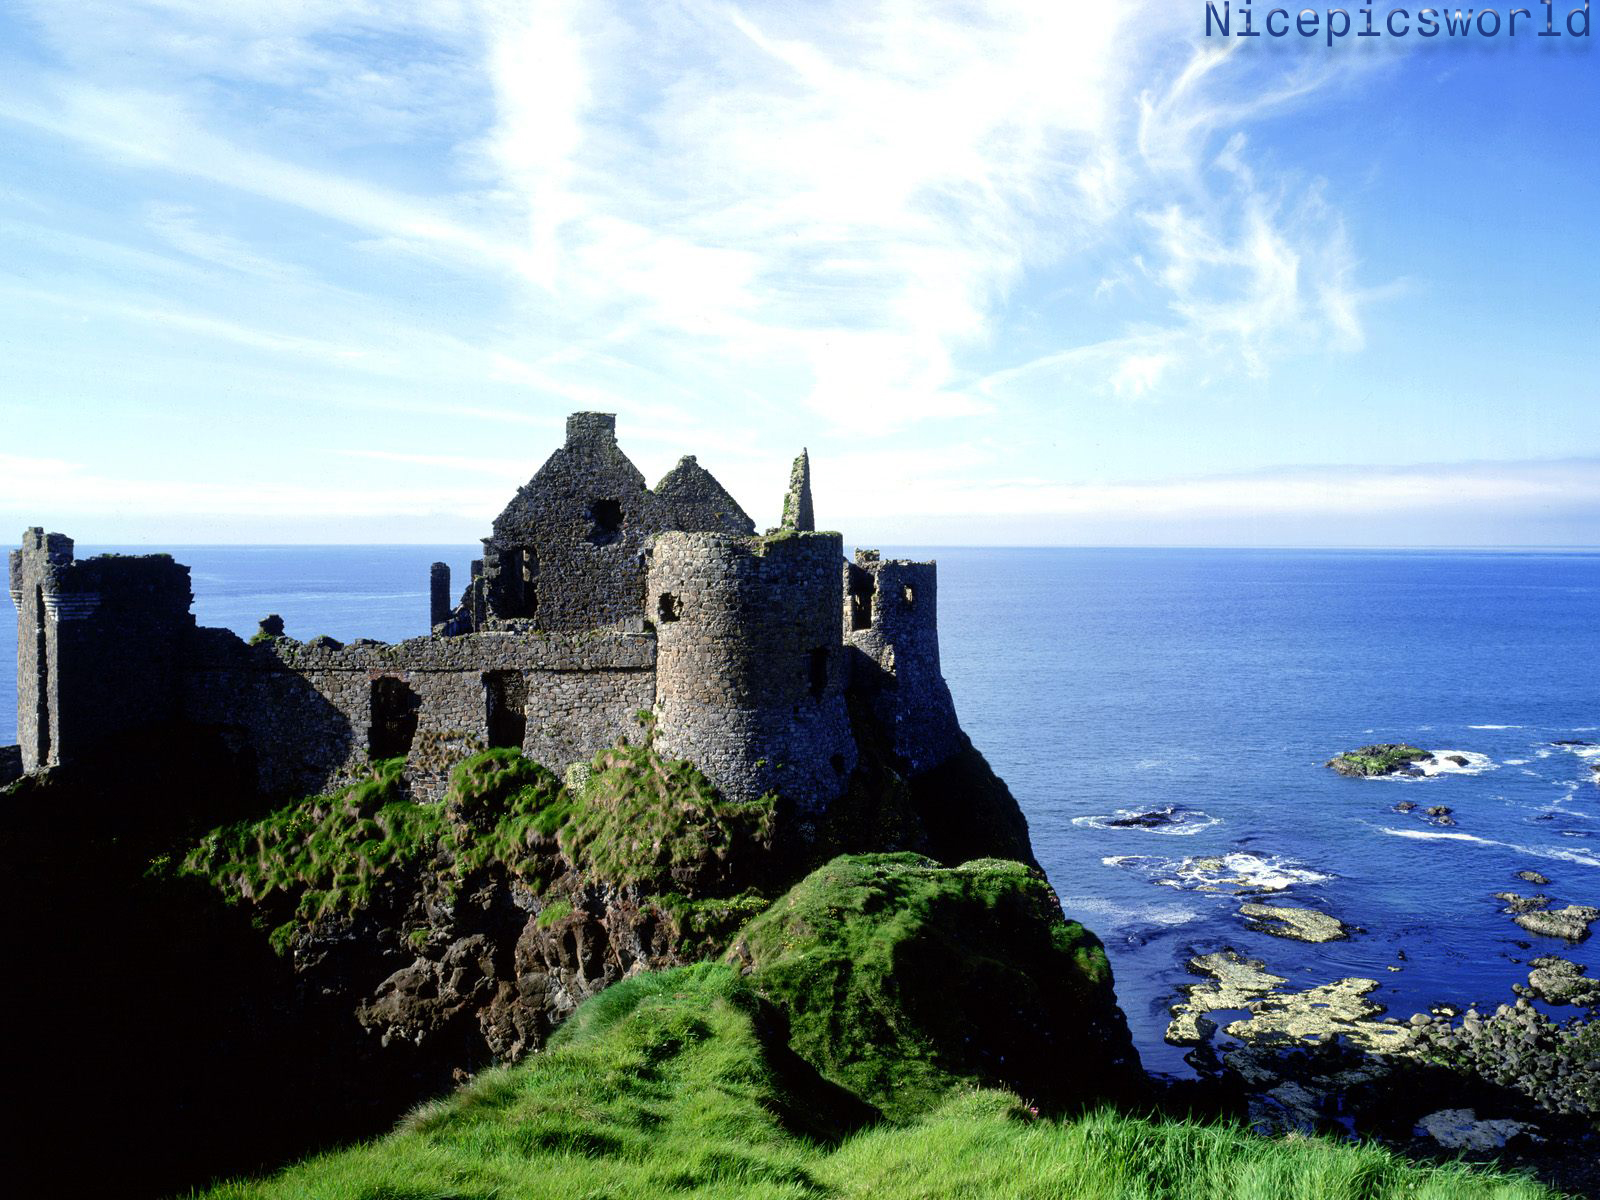 Pictures World: Irish Castle Nice wallpapers Ireland Castle Wallpaper